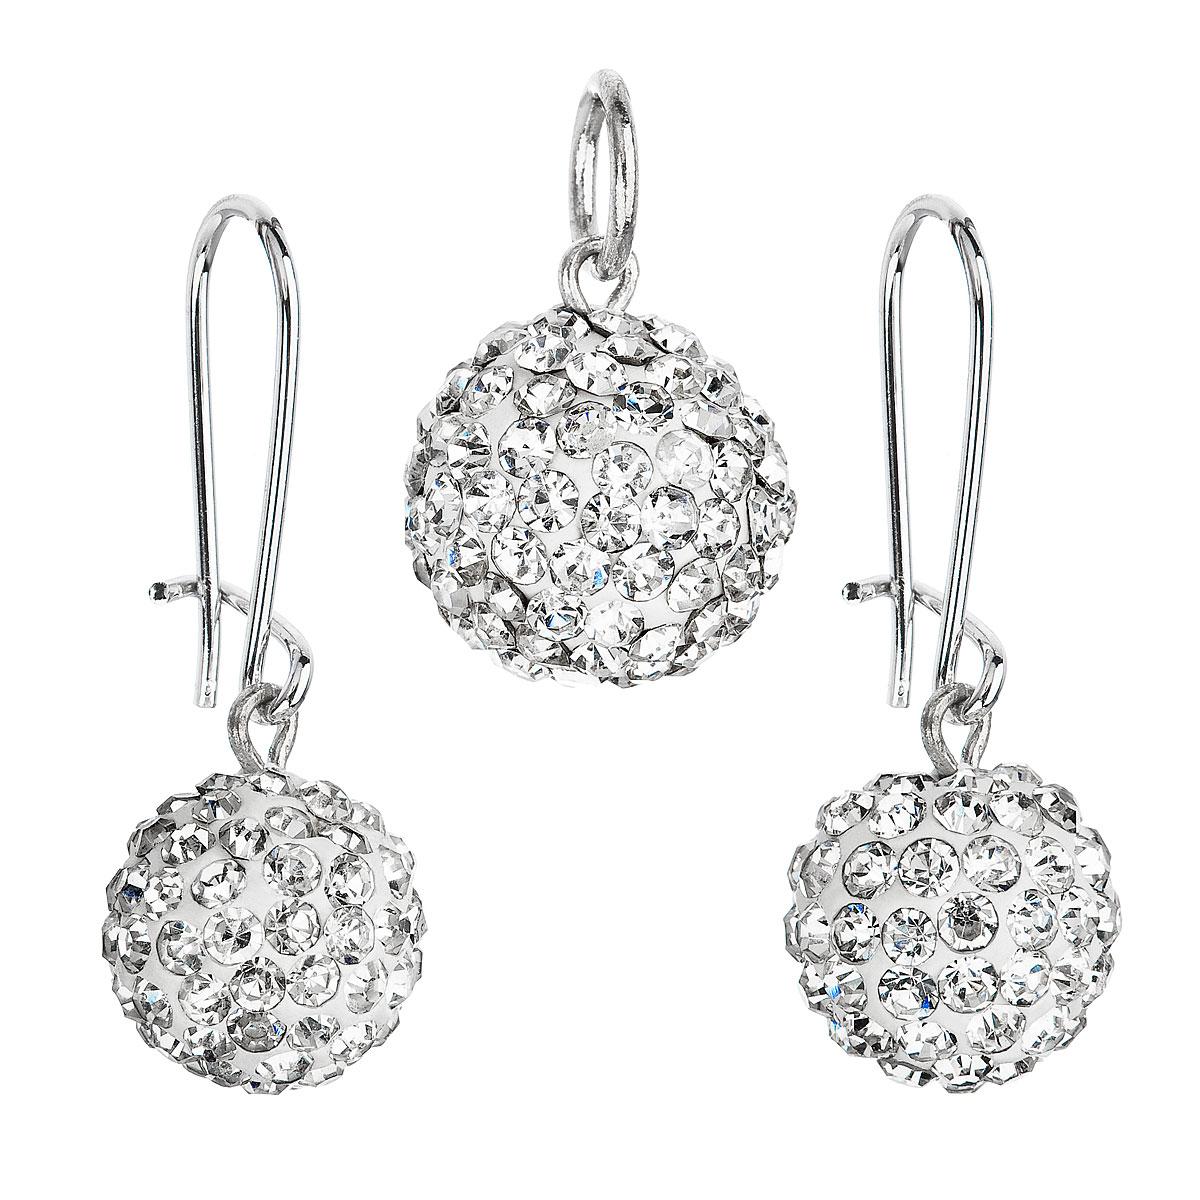 Souprava bižuterie se Swarovski krystaly bílá kulatá 56015.1